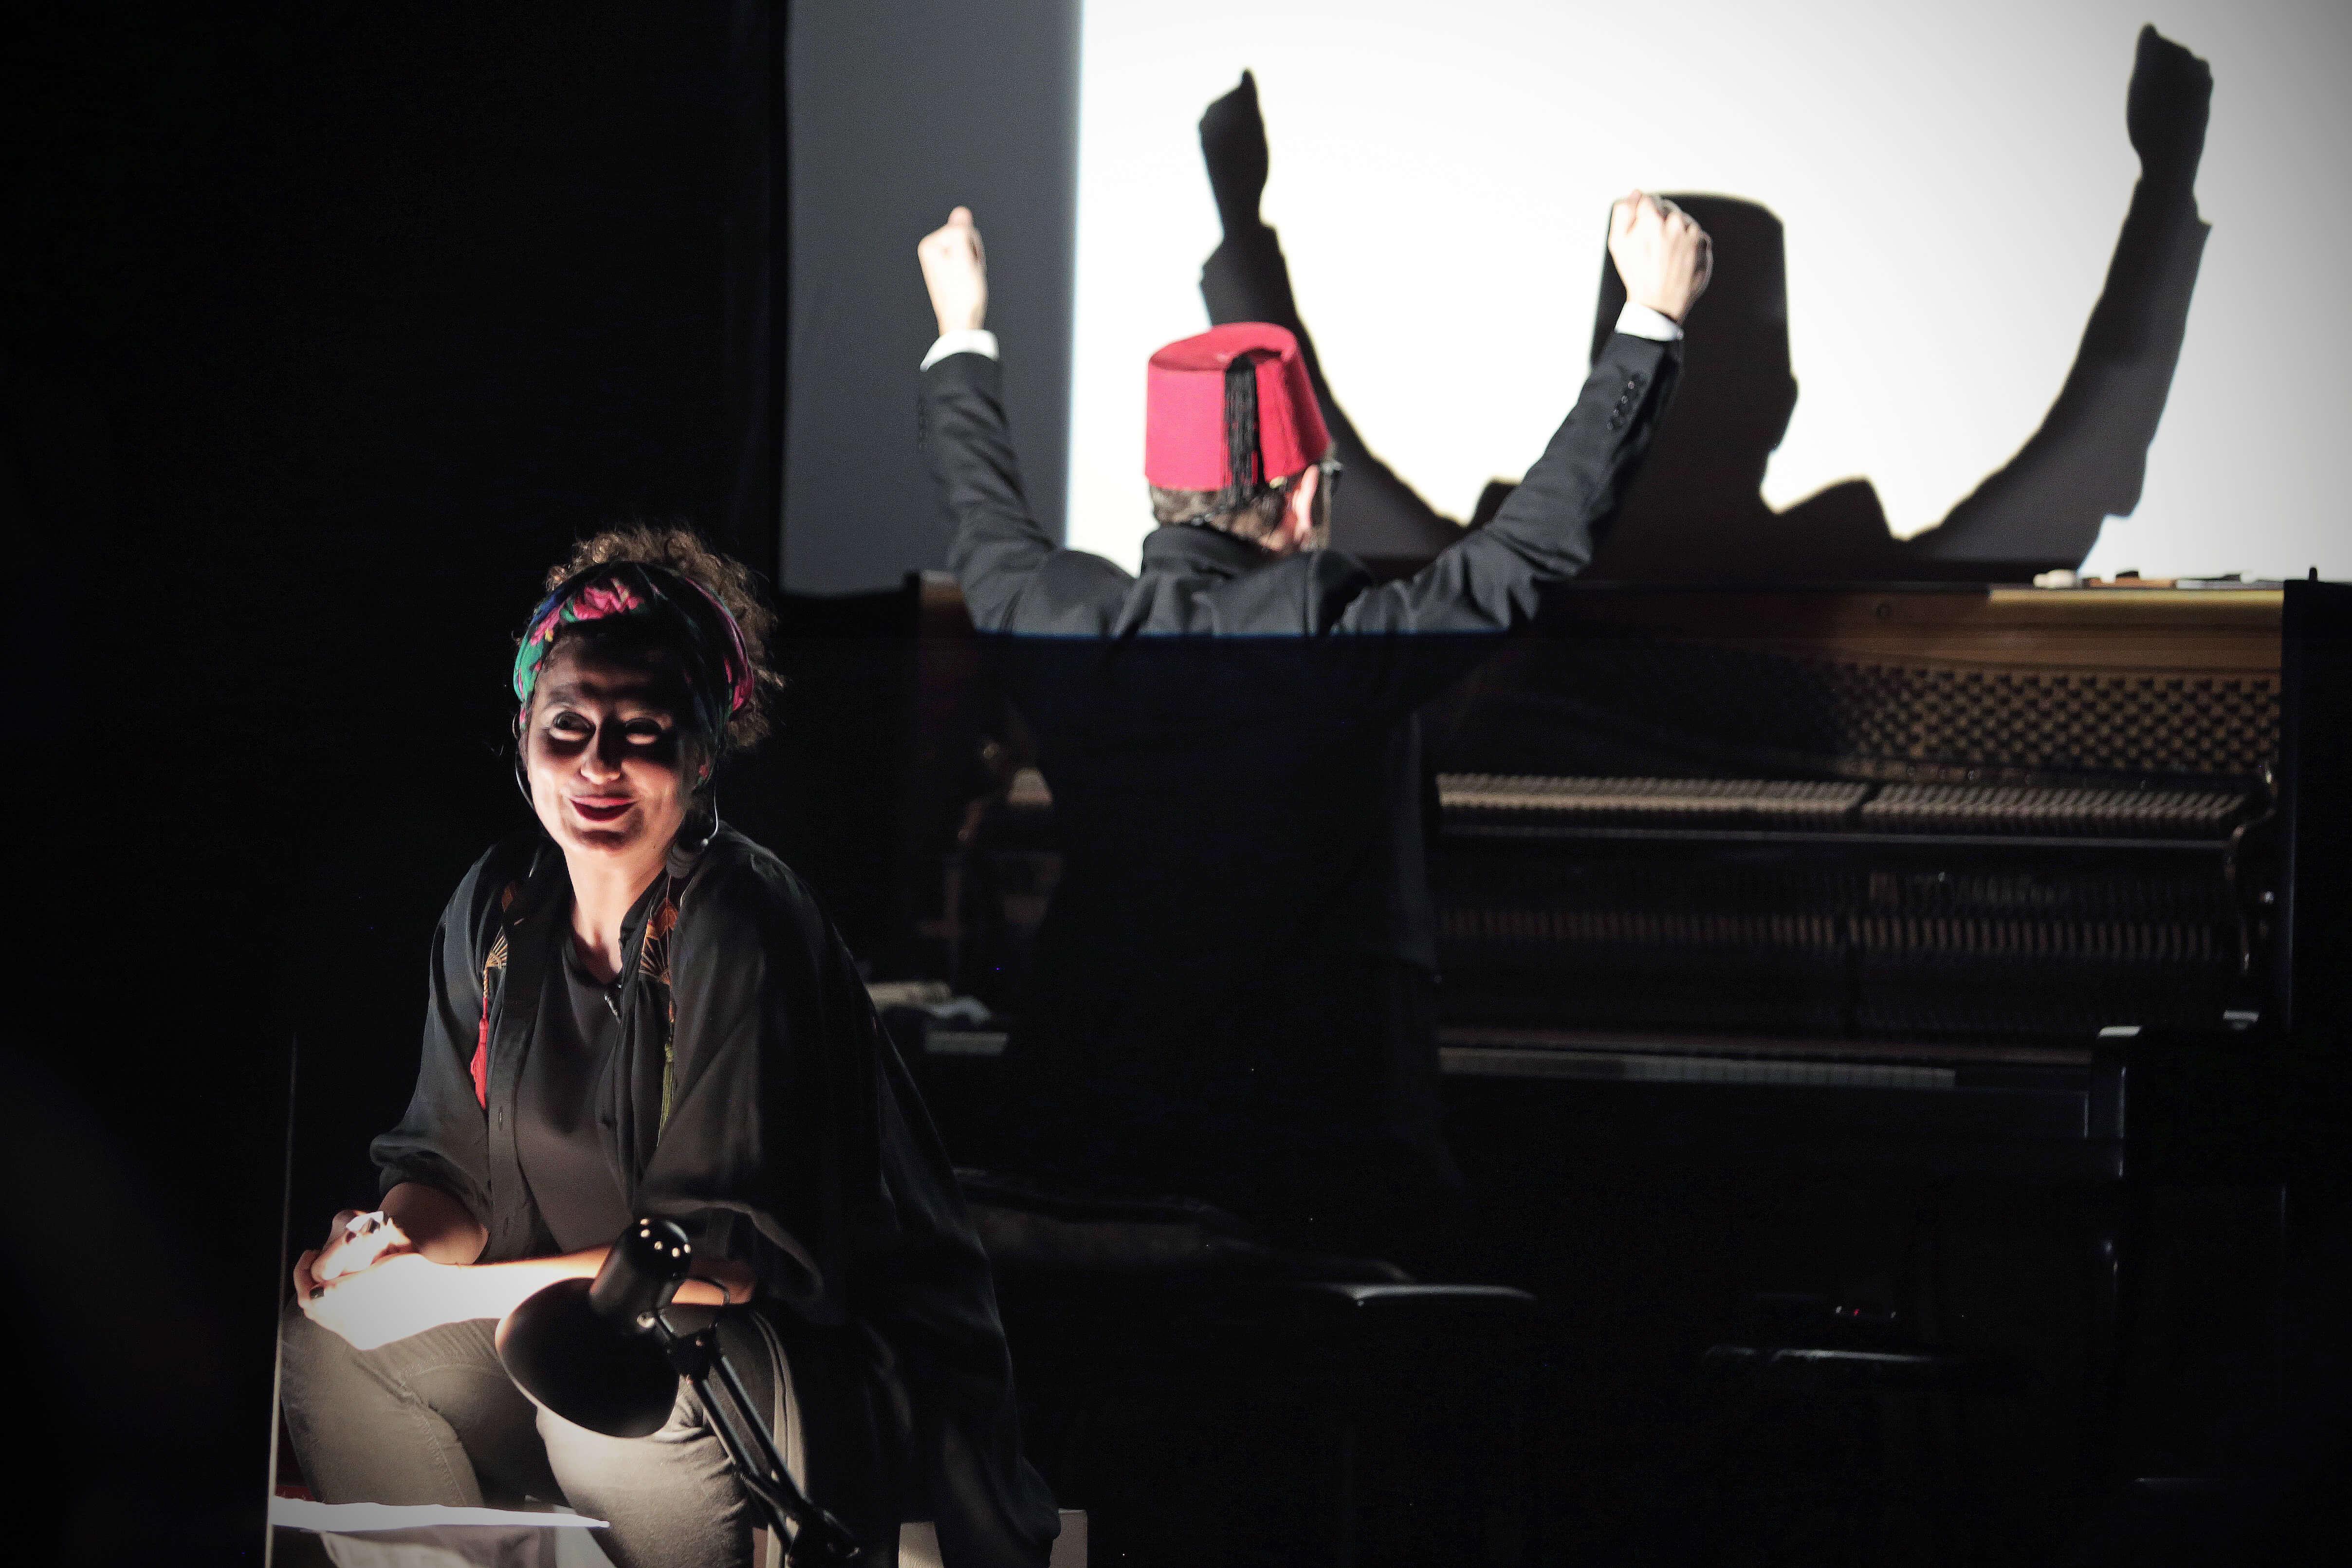 Piano oriental, lecture dessinée